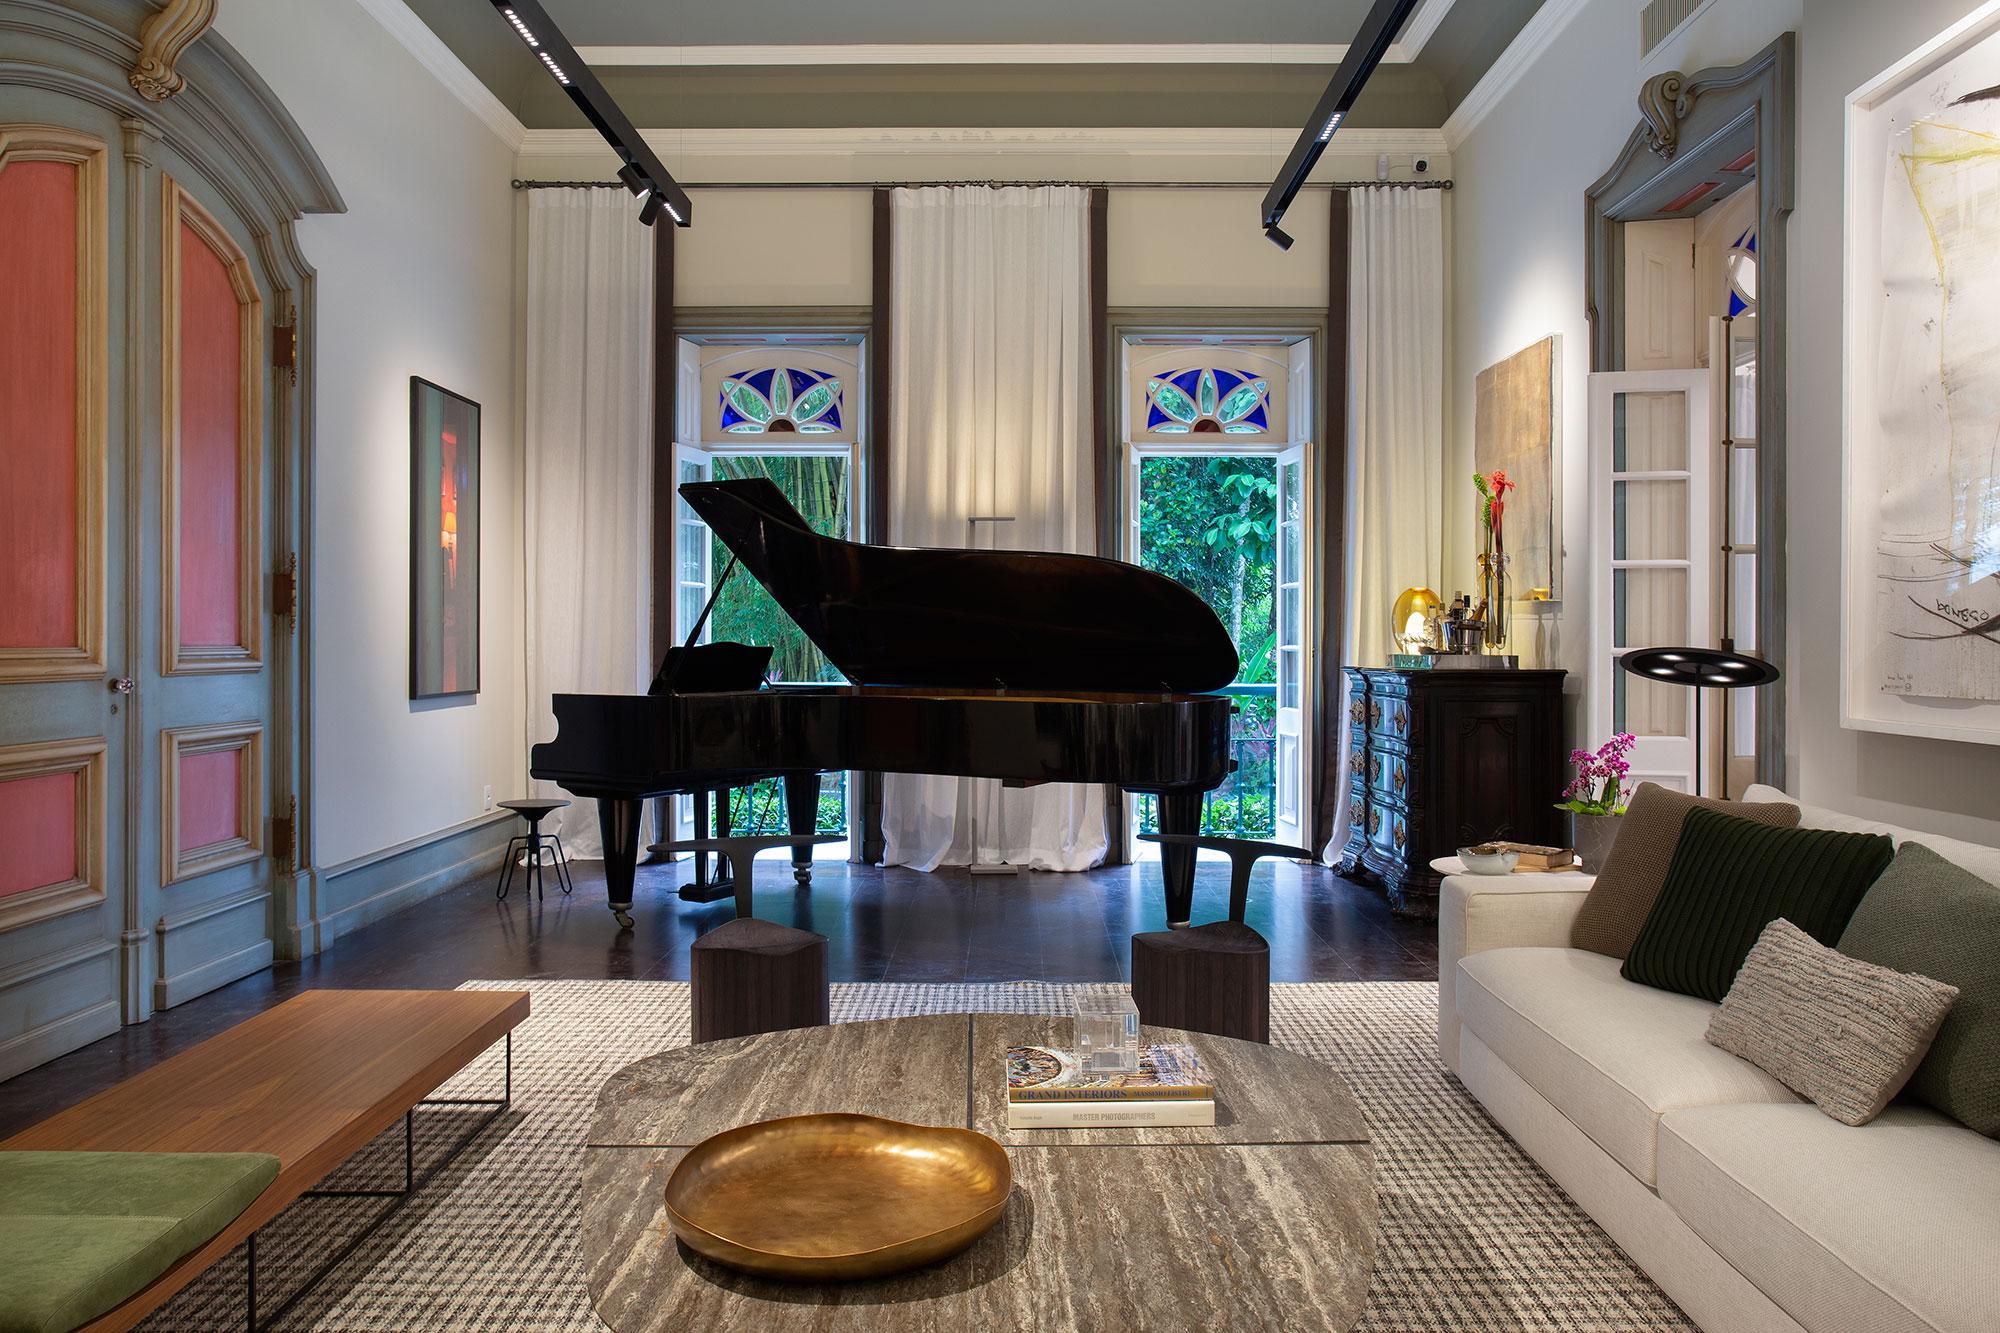 luiz fernando grabowsky sala do piano casacor rio de janeiro 2021 foto denilson machado